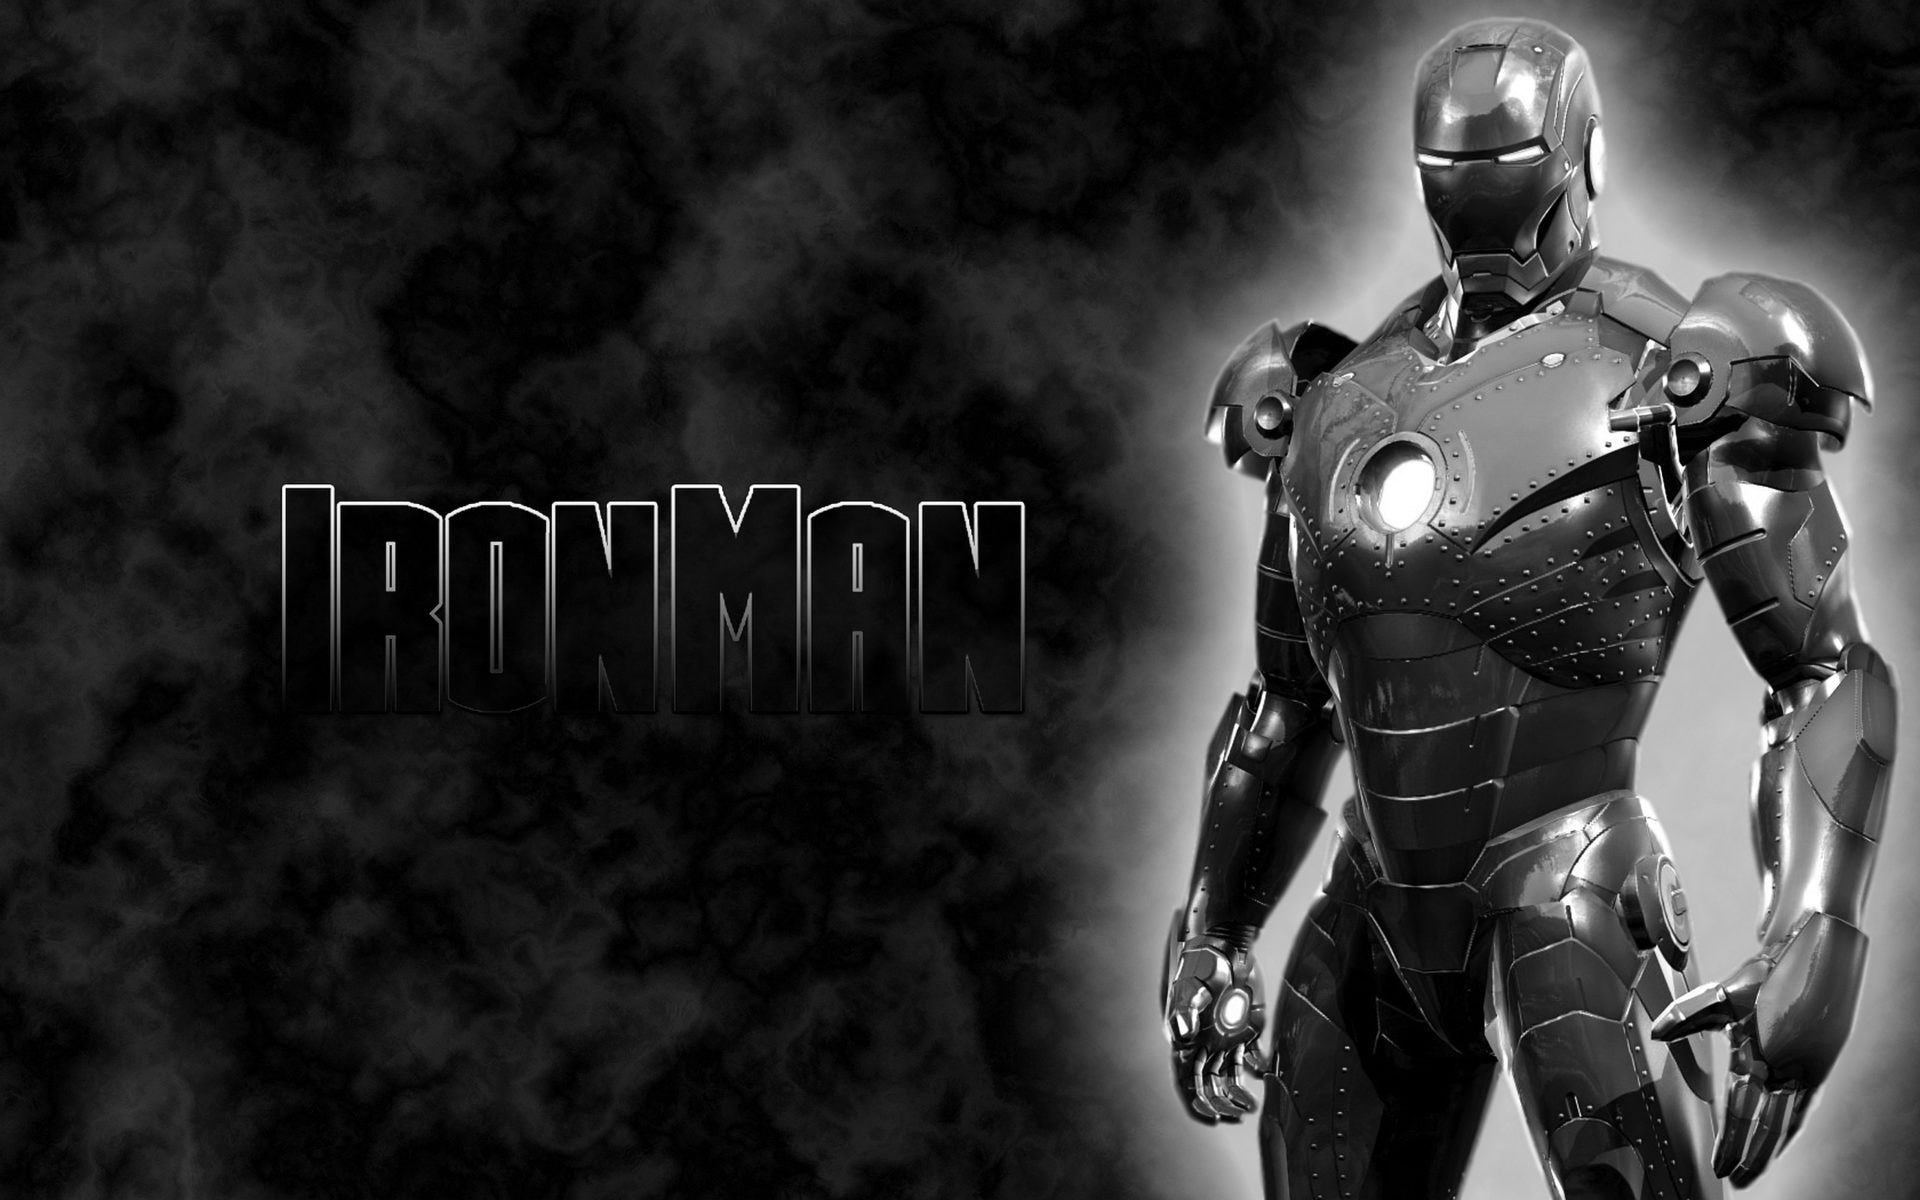 Iron Man Hd Wallpaper New Tab Theme Playtime